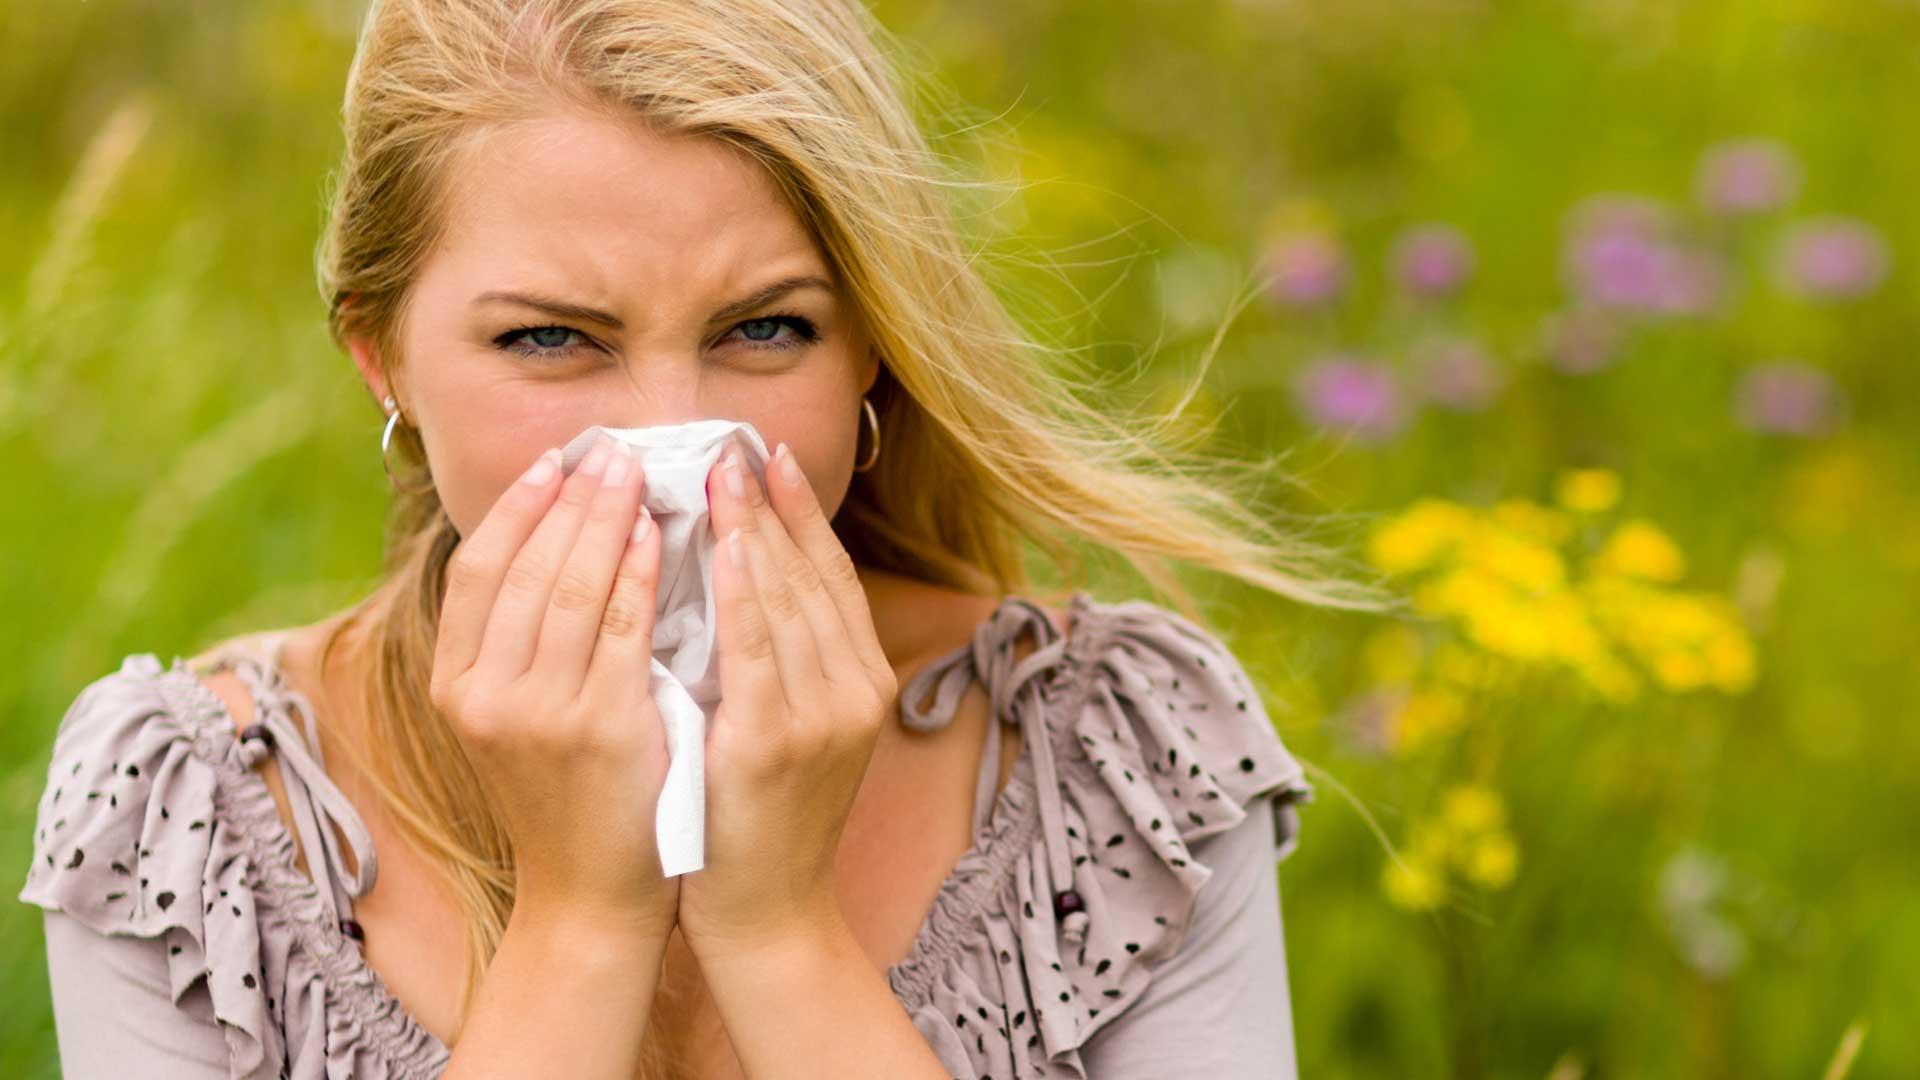 2019-a-Record-Breaking-Allergy-Season-for-2019th-Consecutive-Spring.jpg